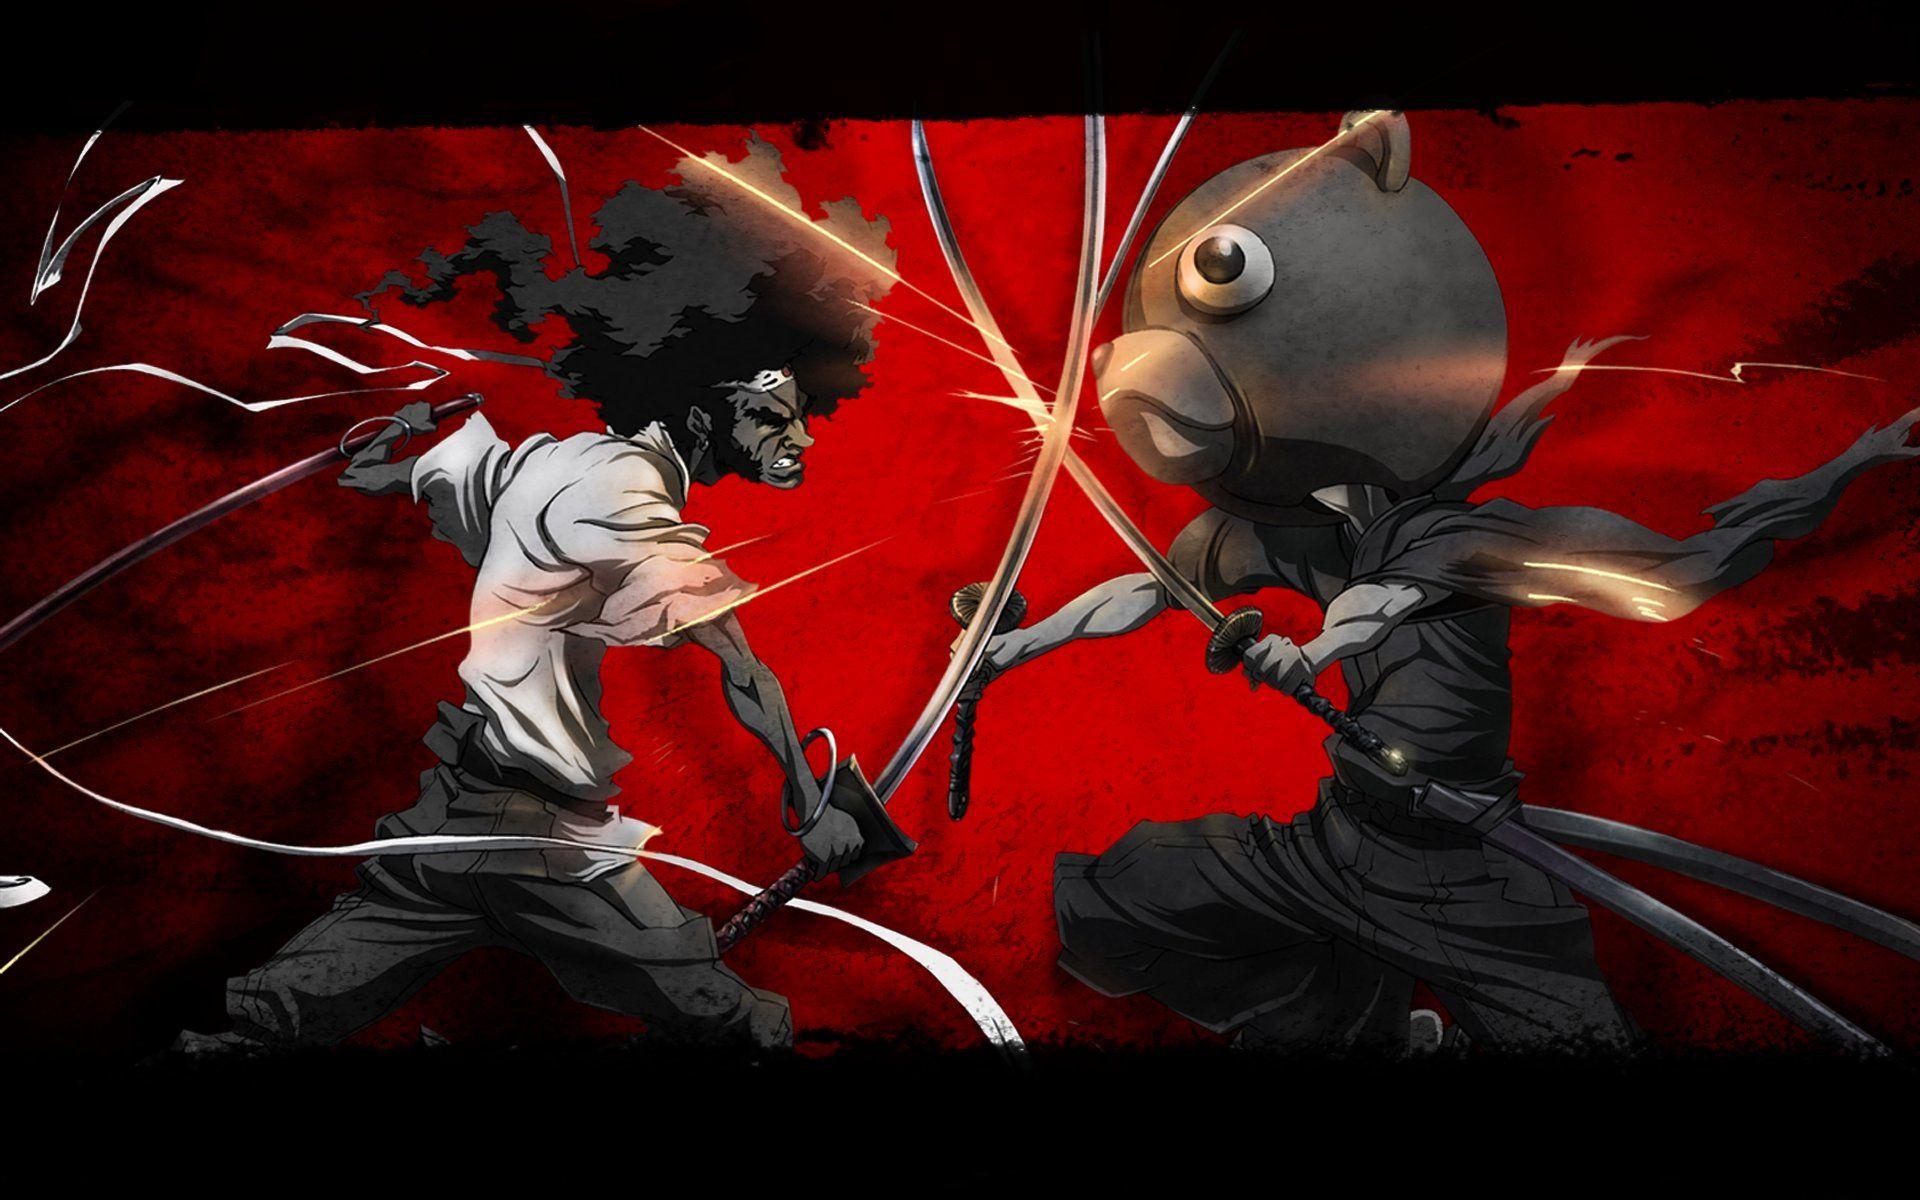 Afro Samurai Kuma Wallpaper Images (With images) Afro